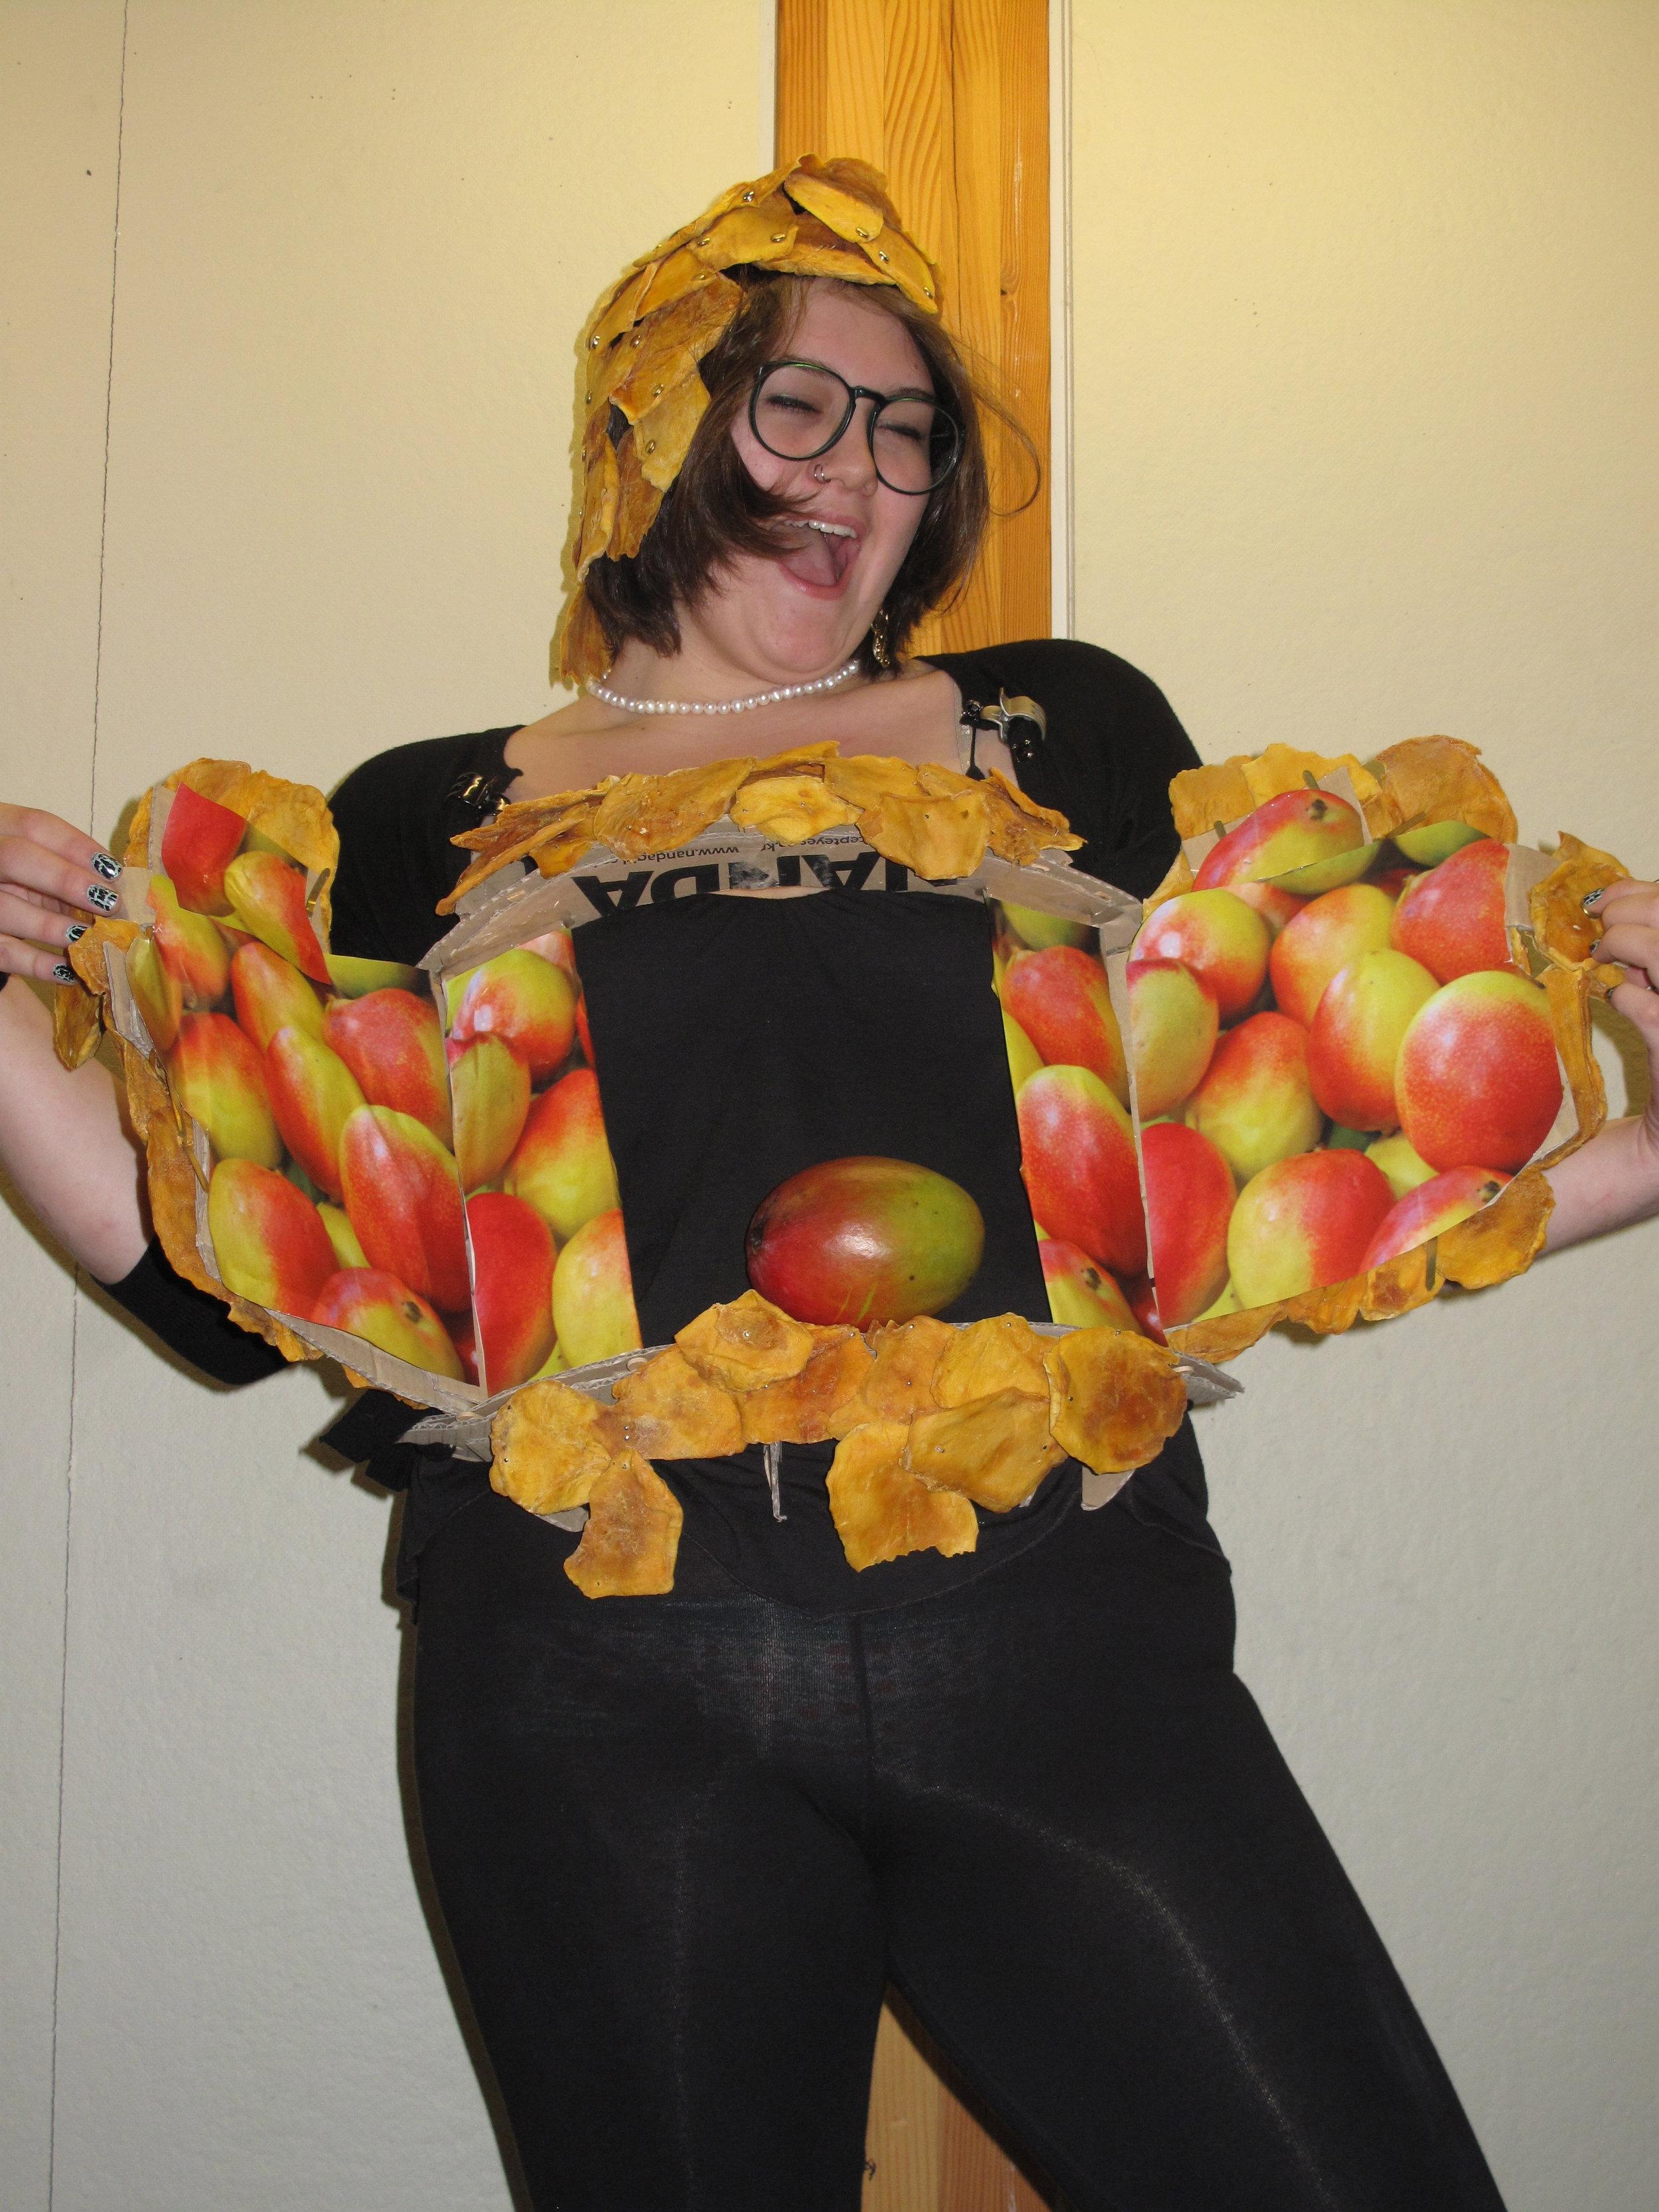 Flo A-Belly Full of Mangos.jpg